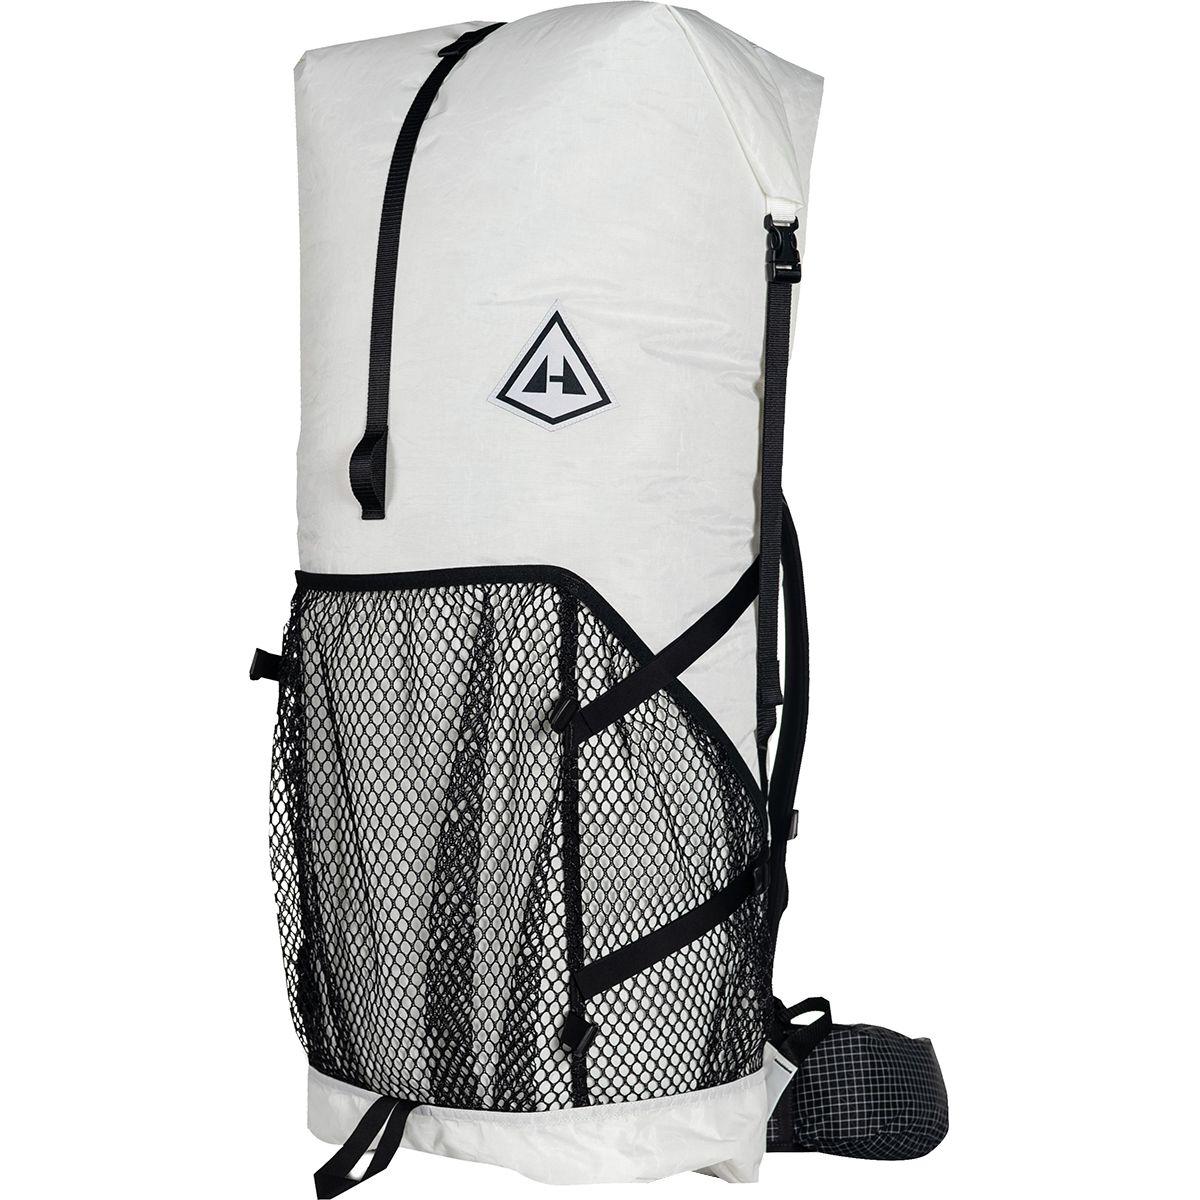 Hyperlite Mountain Gear 4400 Windrider